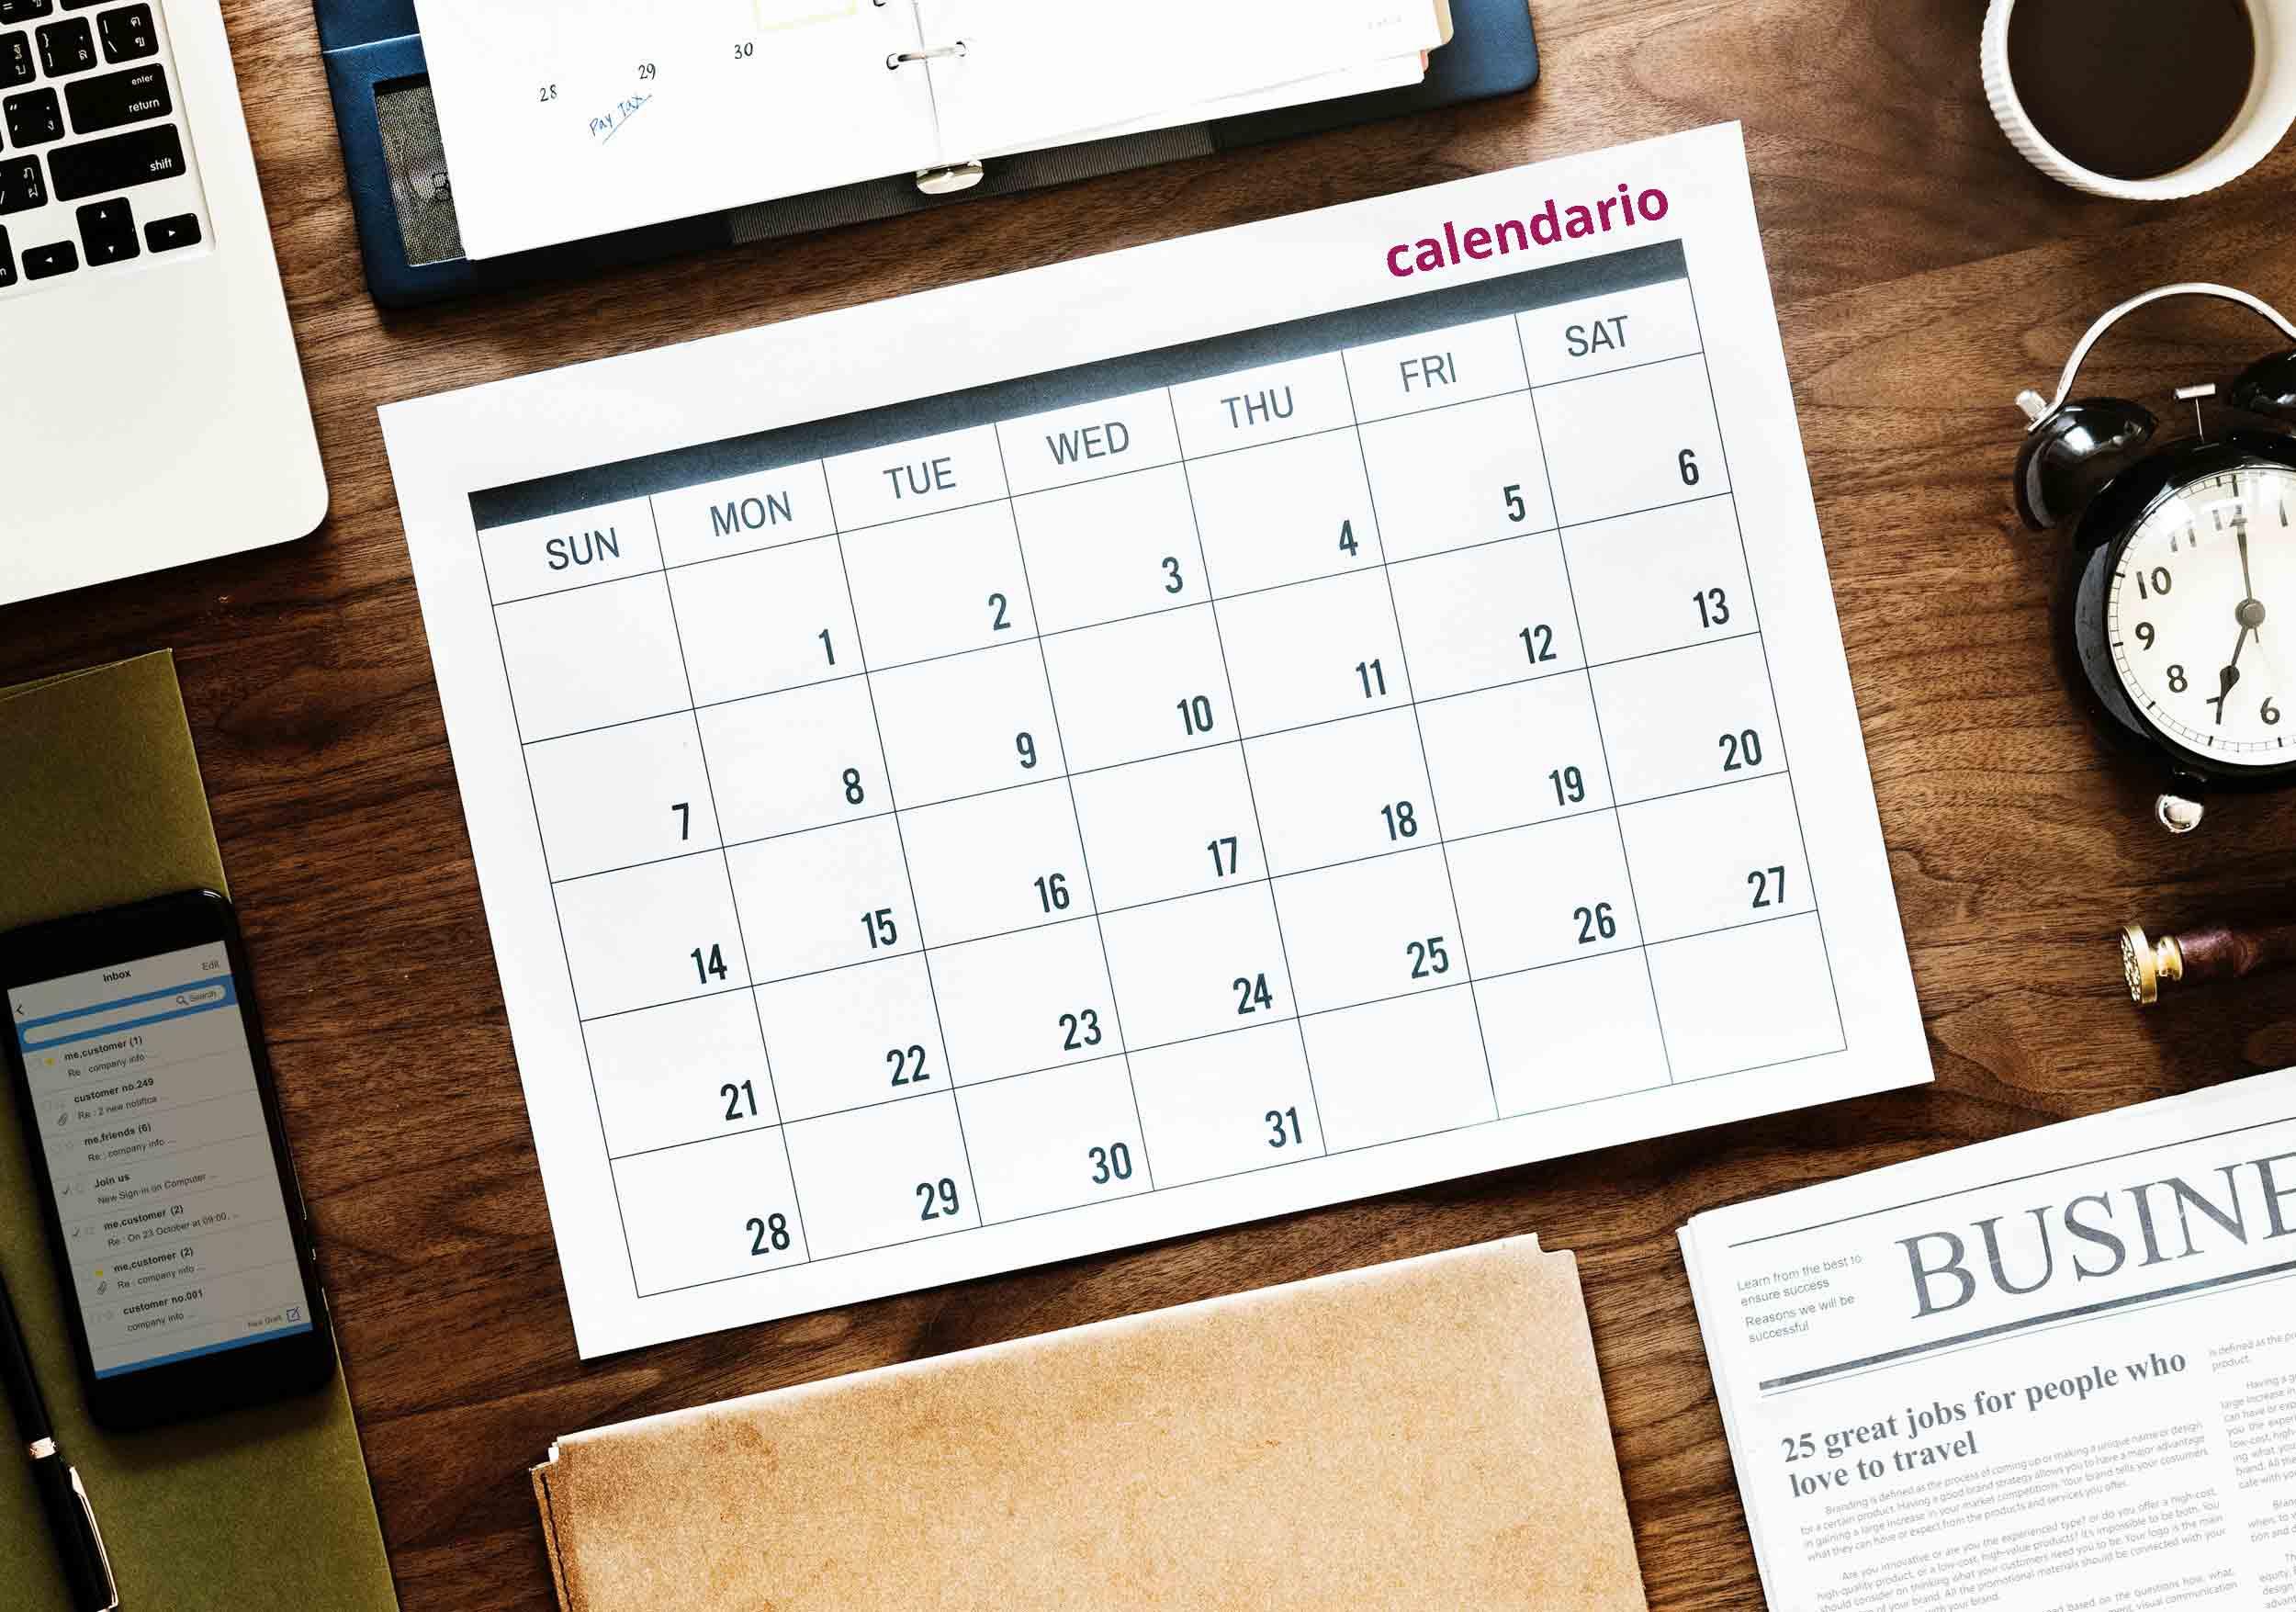 Preguntas frecuentes (FAQs)